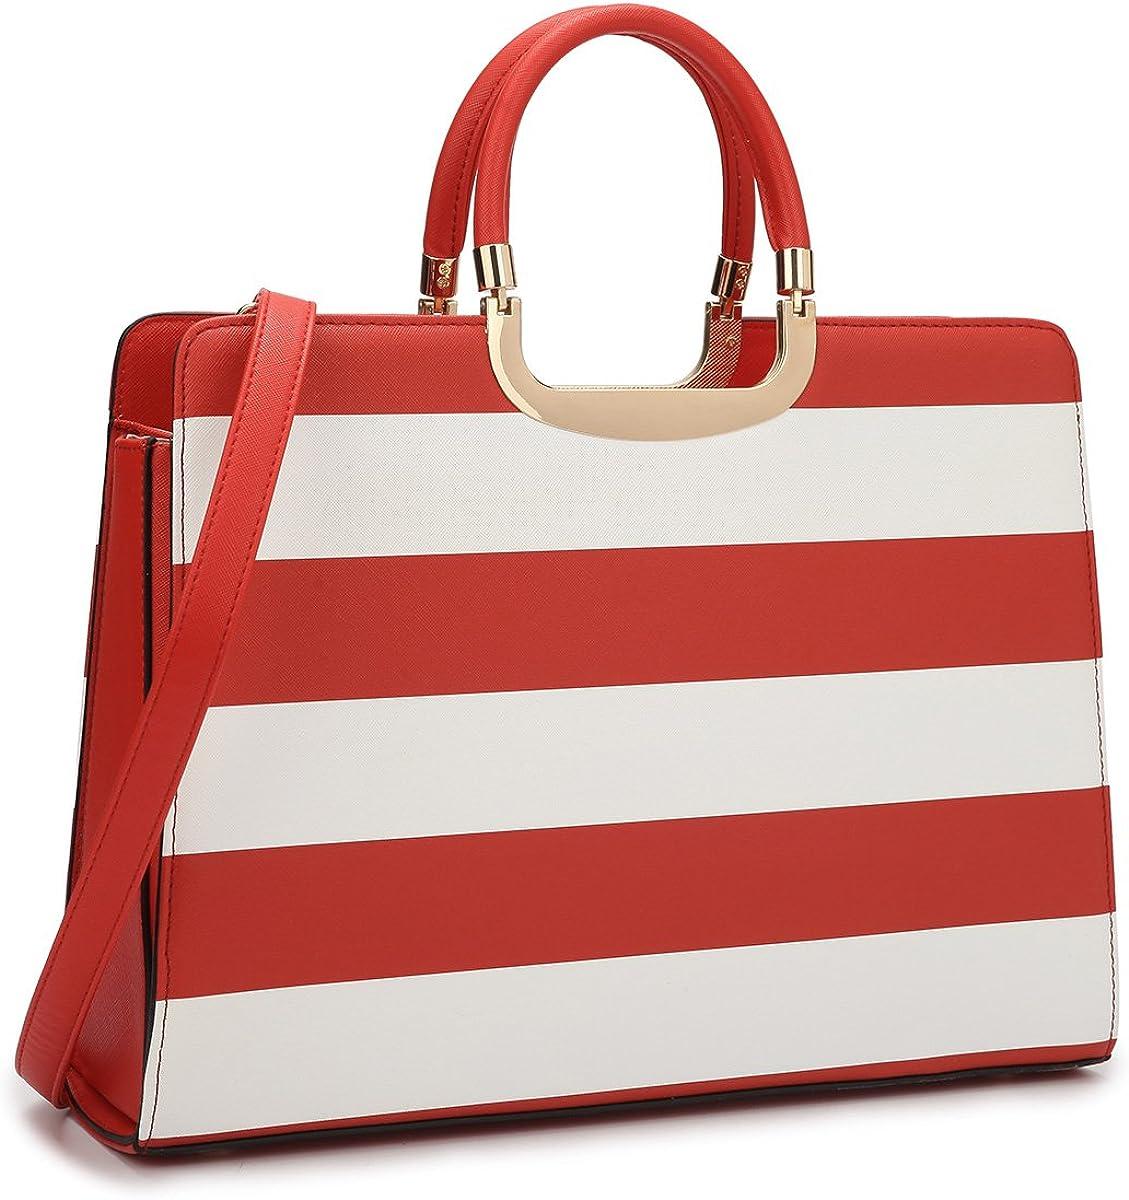 Dasein Women Top-handle Satchel Purses and Handbags for Ladies Striped Shoulder Bags Work Tote